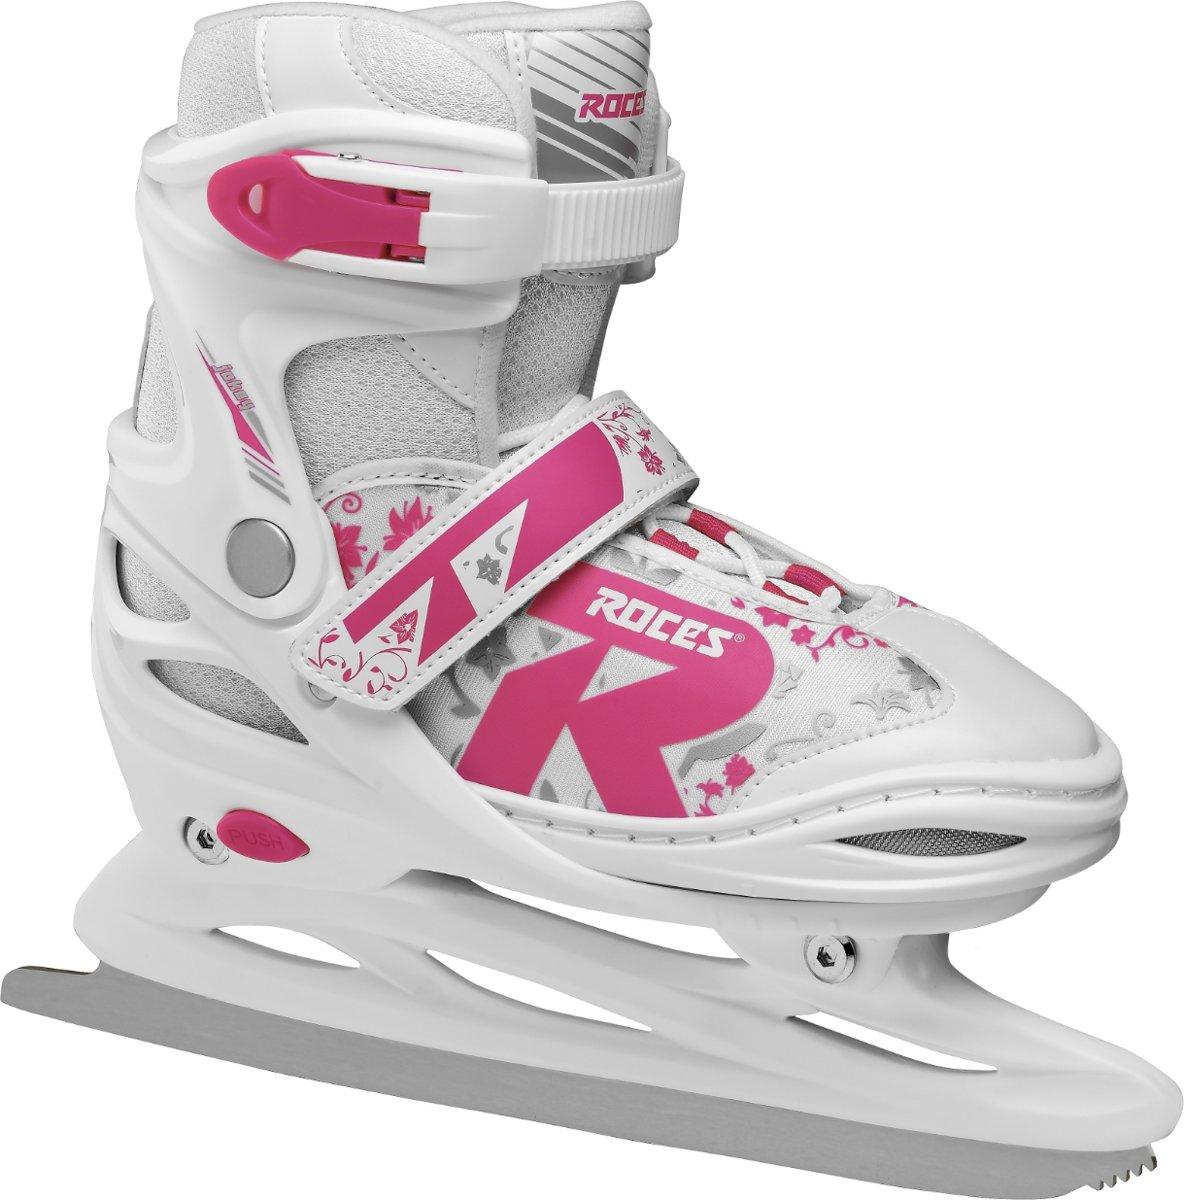 Roces ijshockeyschaatsen Jokey 2.0 meisjes wit maat 26-29